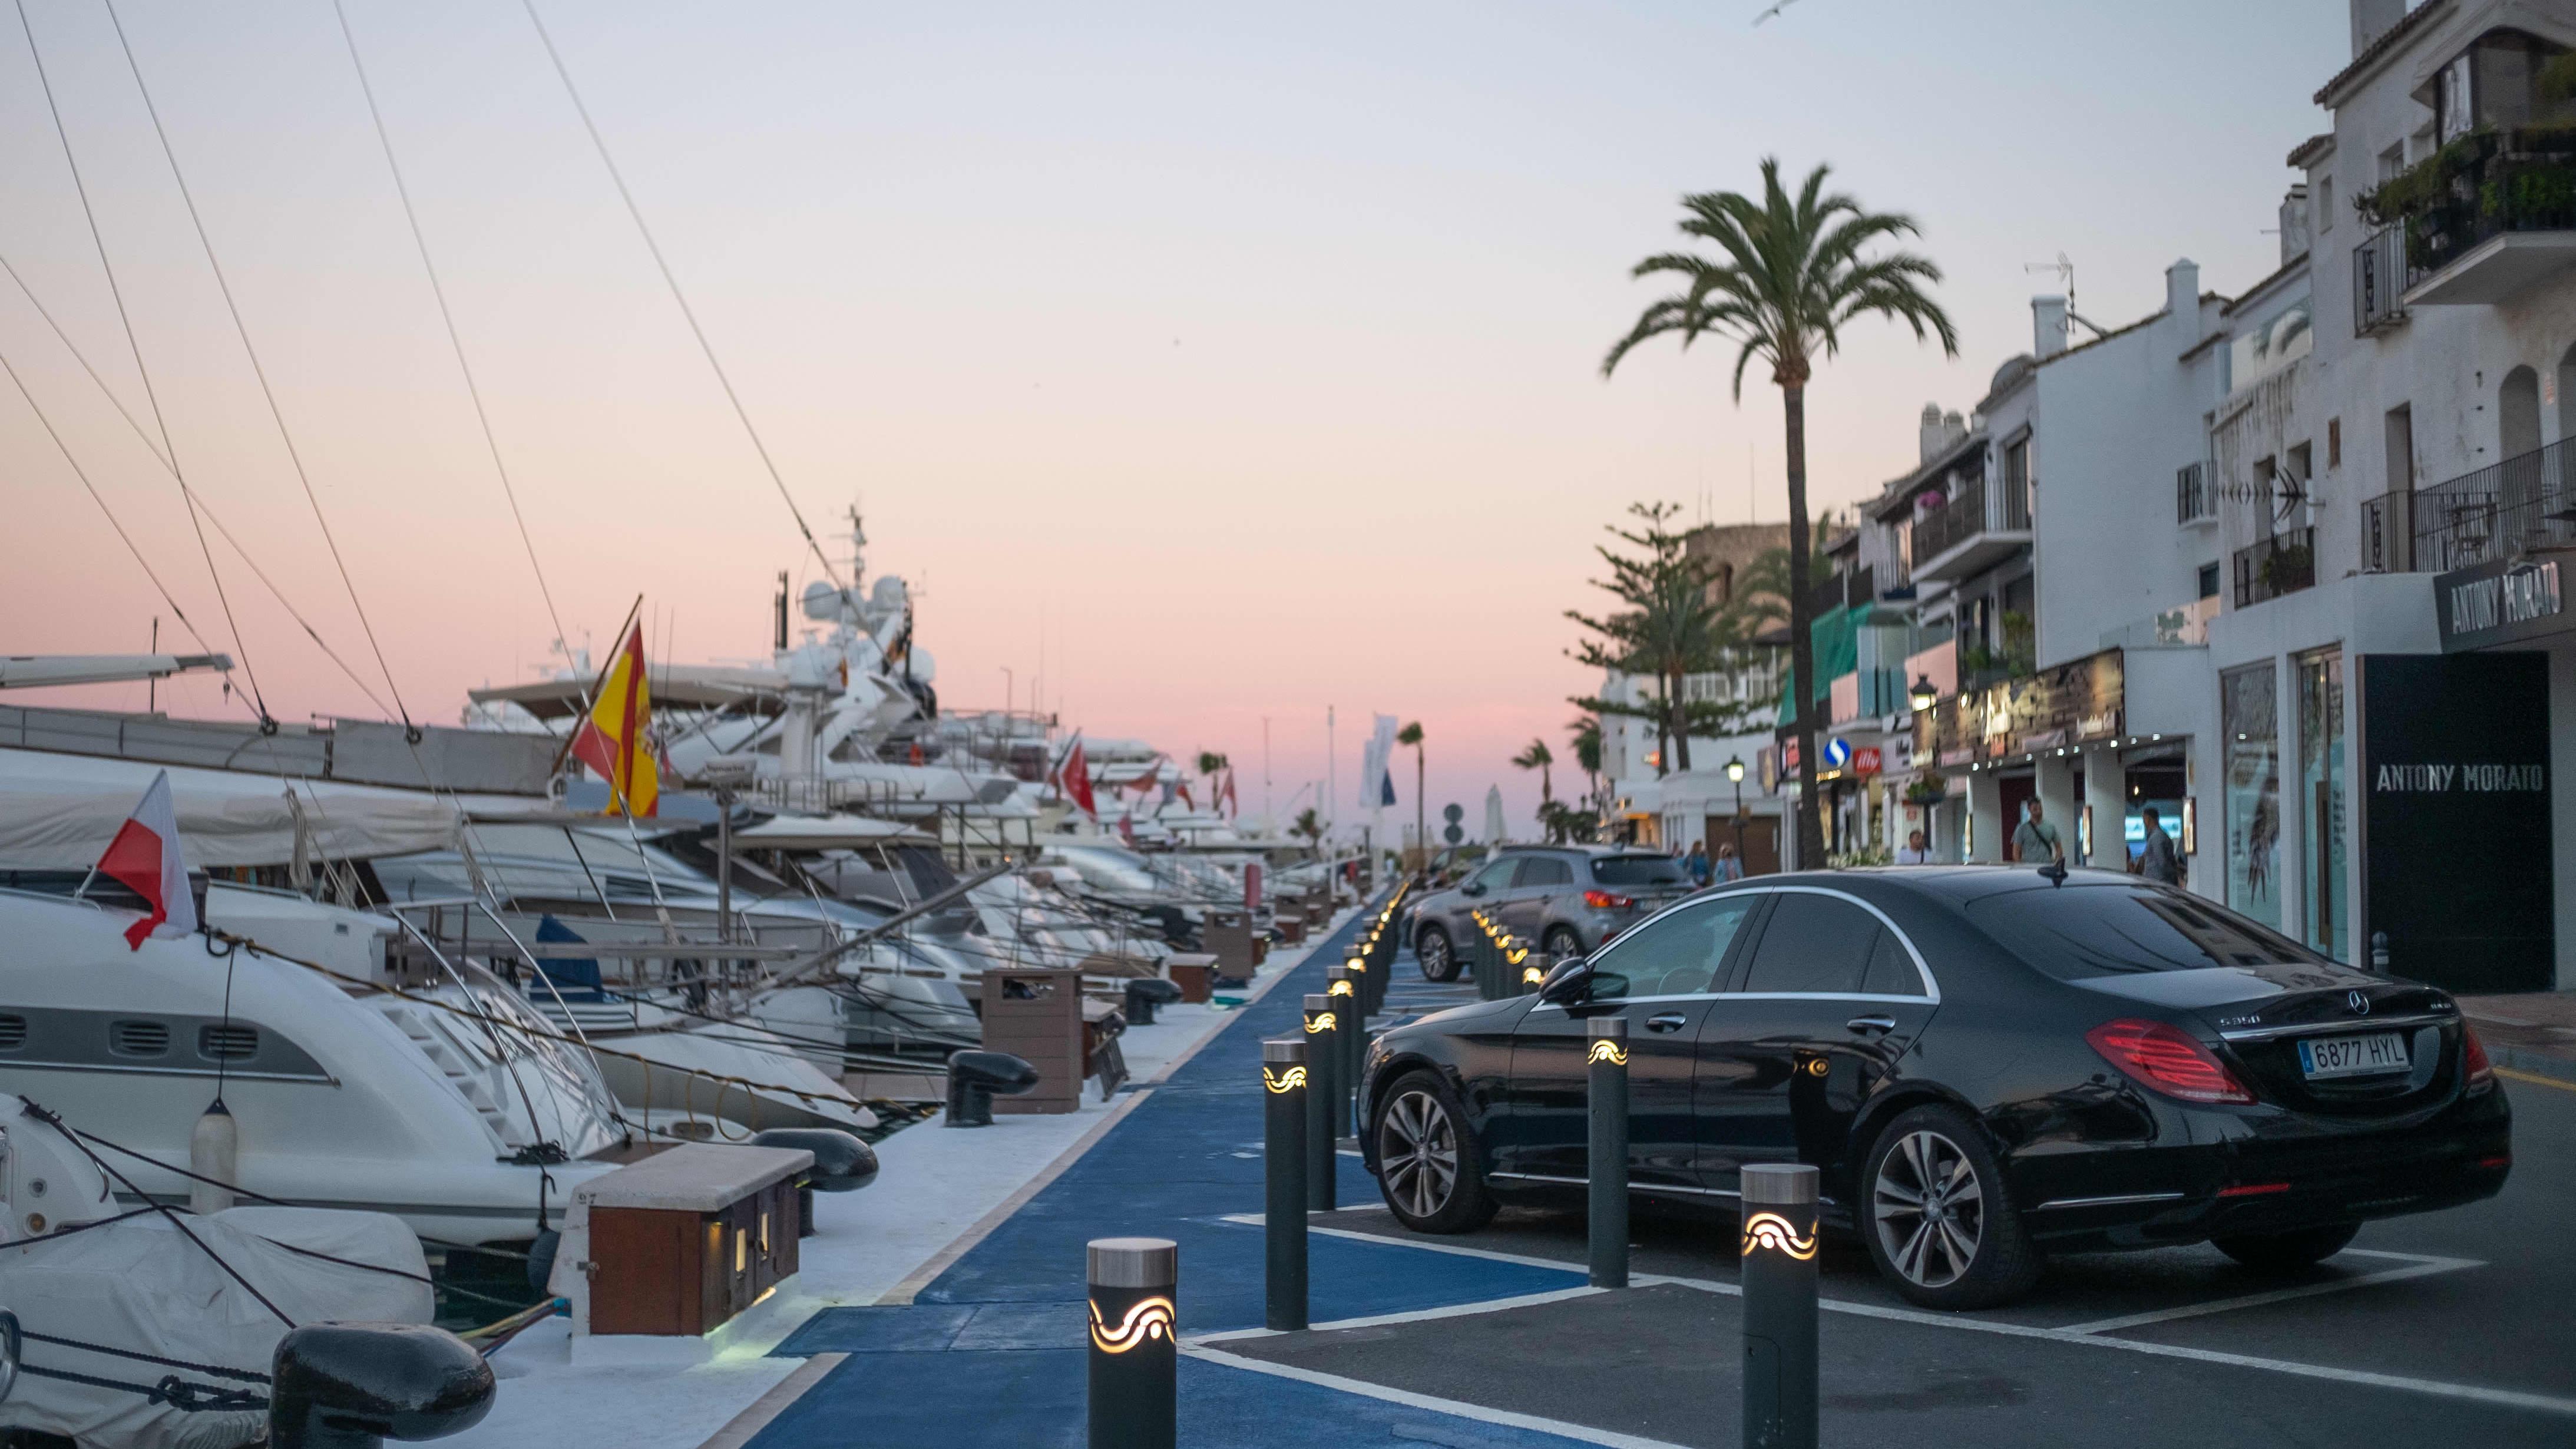 Porto Banusin satama-alue Marbellassa Espanjassa